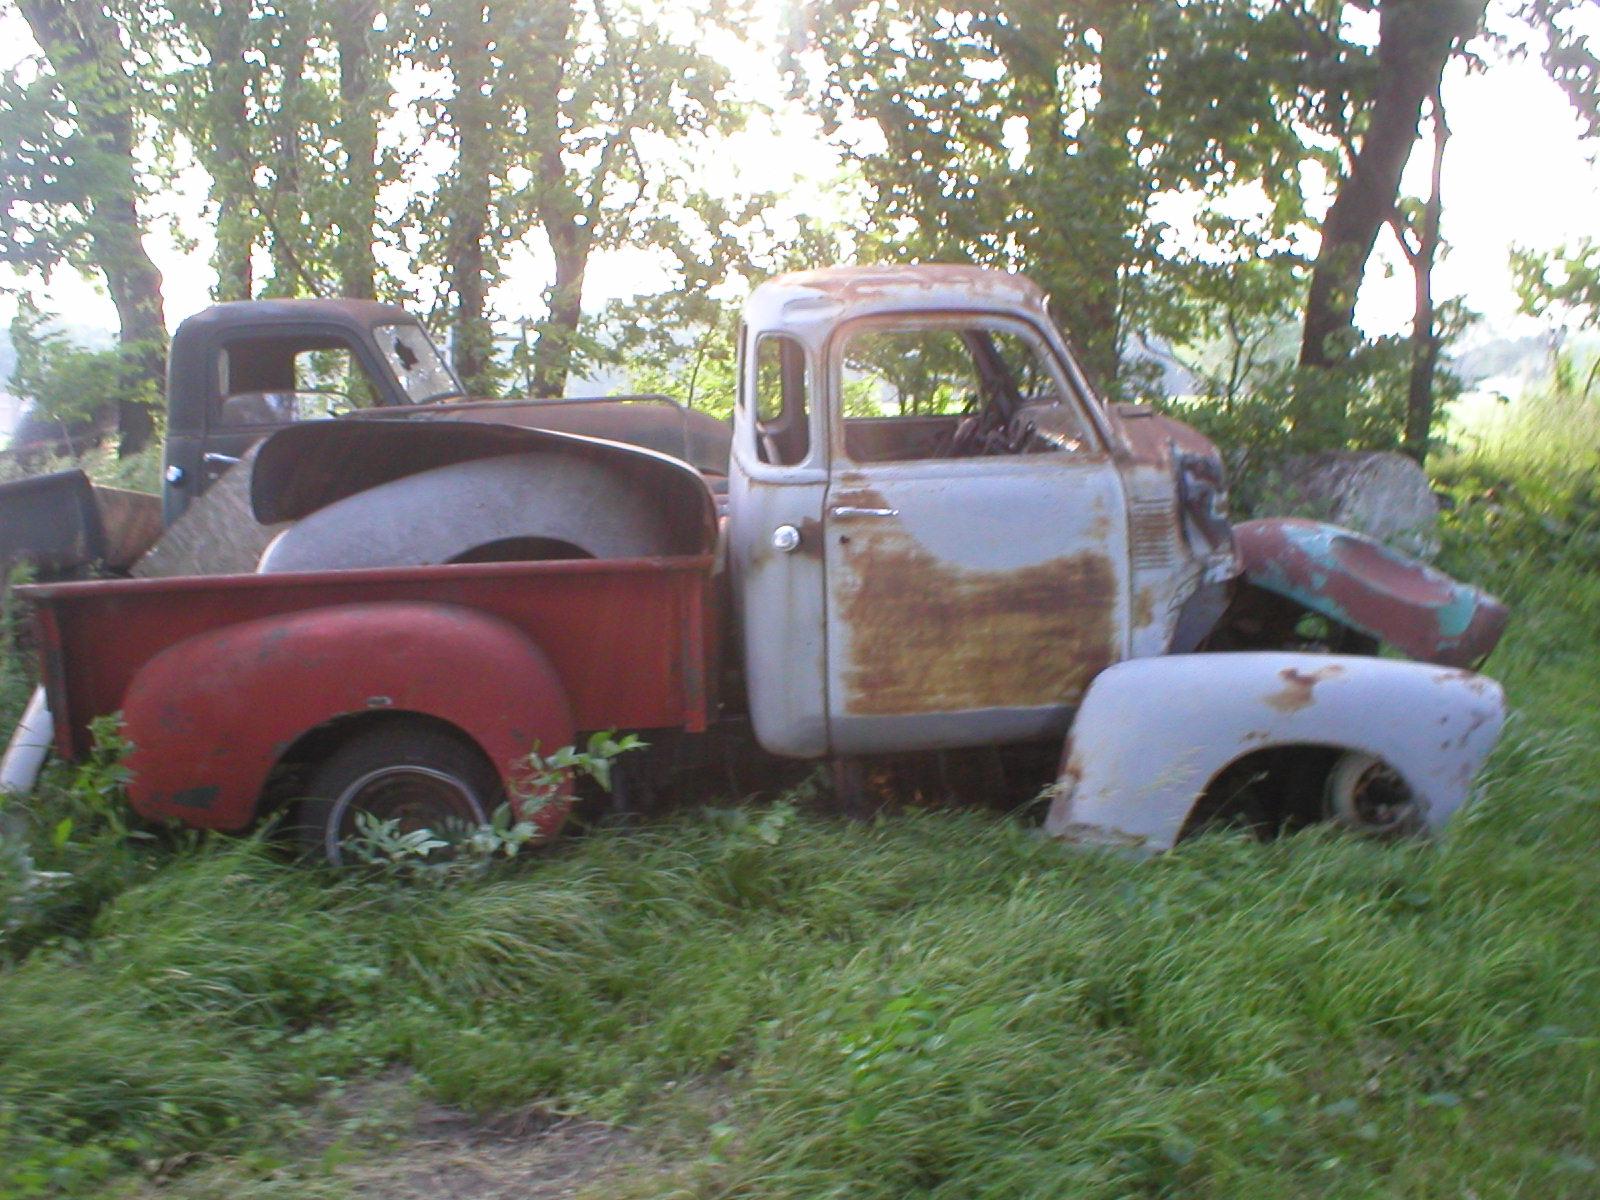 1957 Chevy Truck Craigslist | Autos Weblog